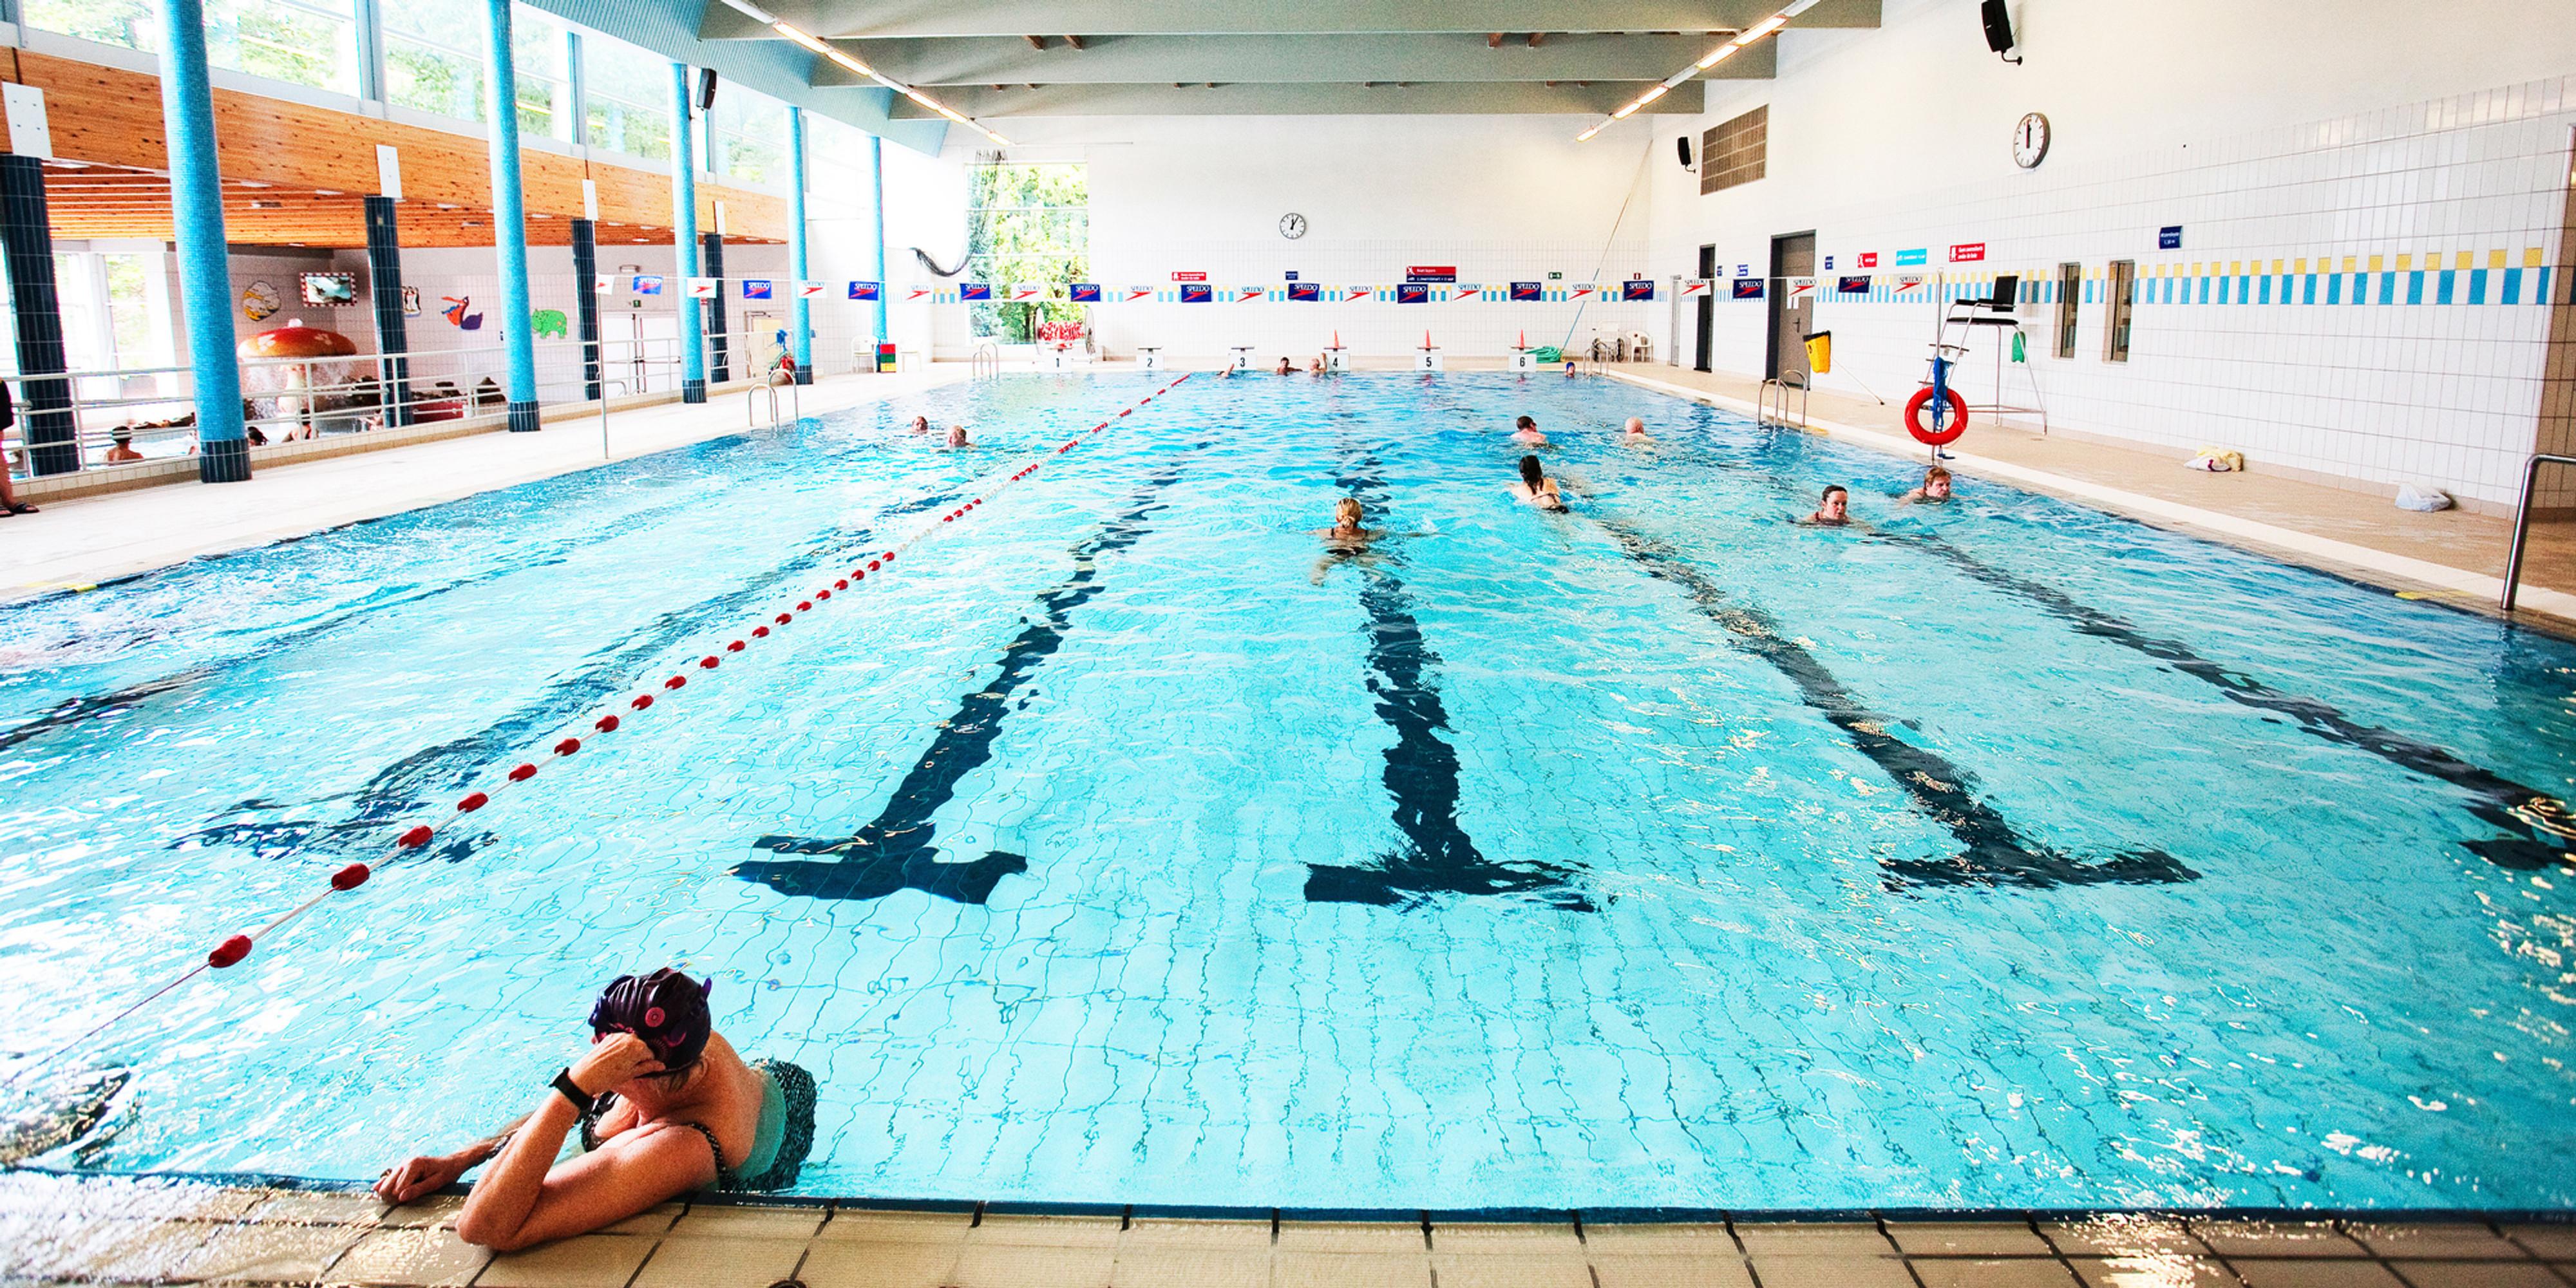 Prive zwemles Schoten